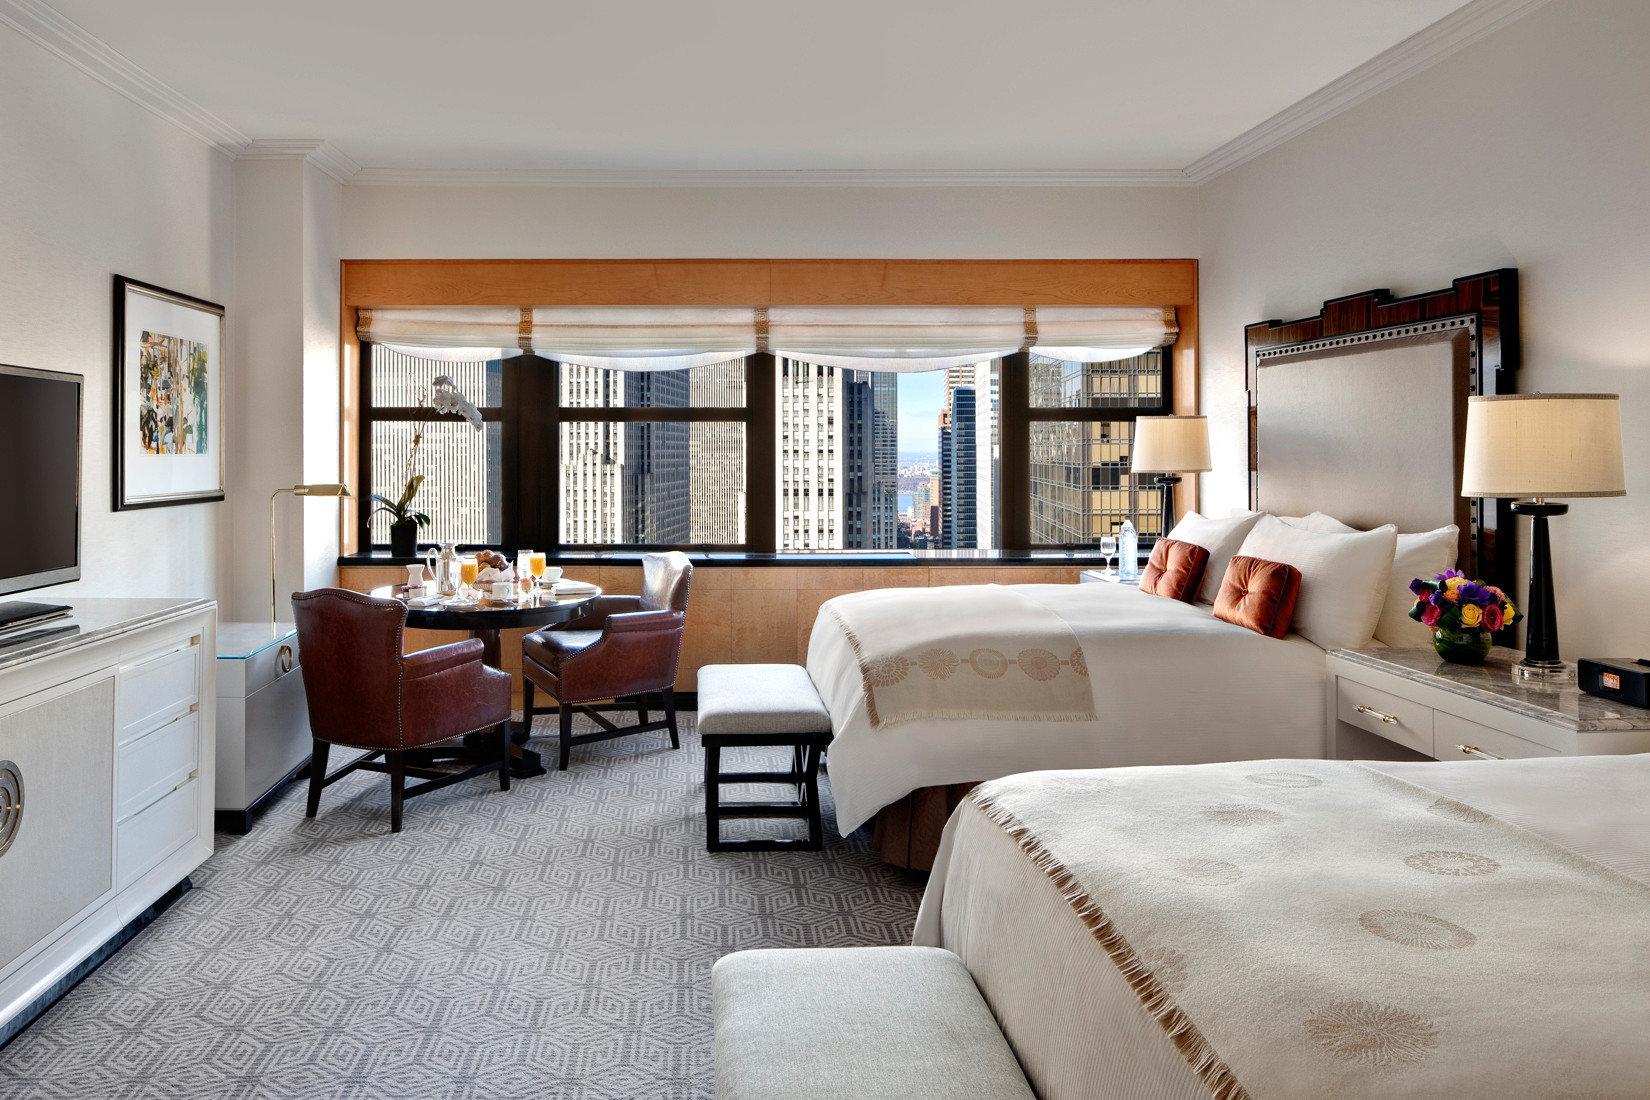 Bedroom City Historic Hotels Modern Trip Ideas sofa property living room home Suite condominium cottage Villa